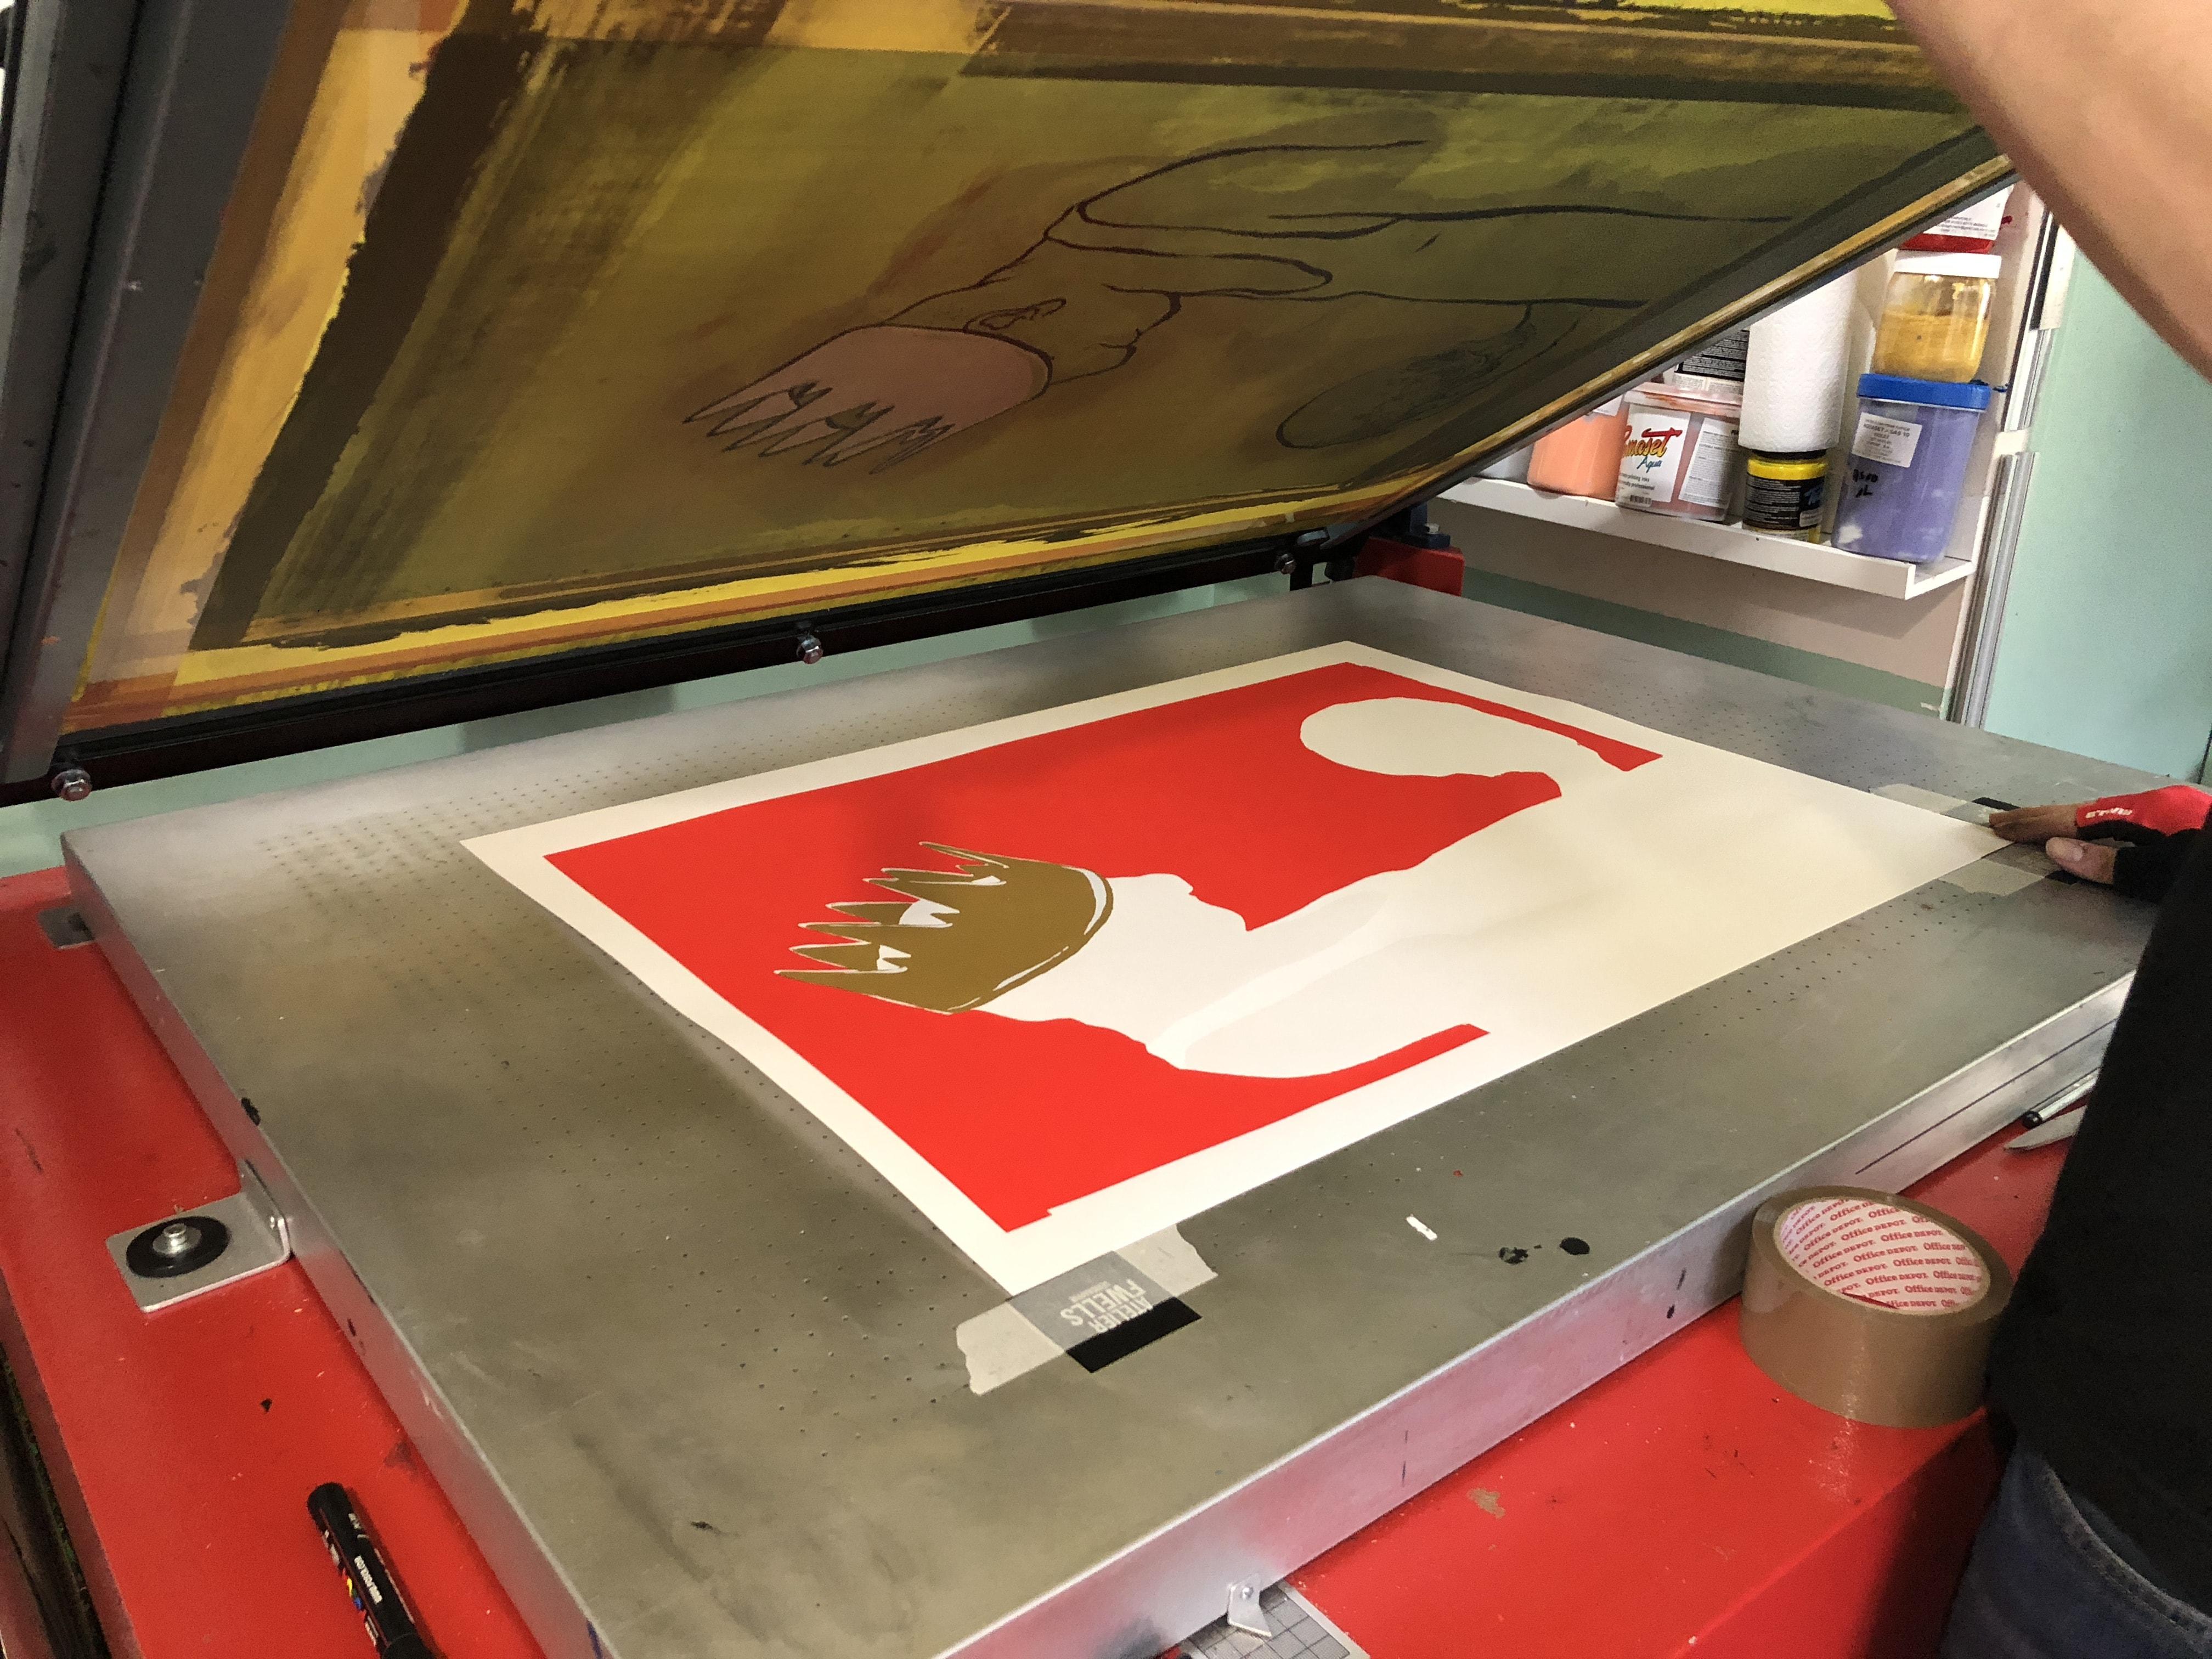 atelier-fwells-serigraphie-paris-estampes-tirages-dart-artisans